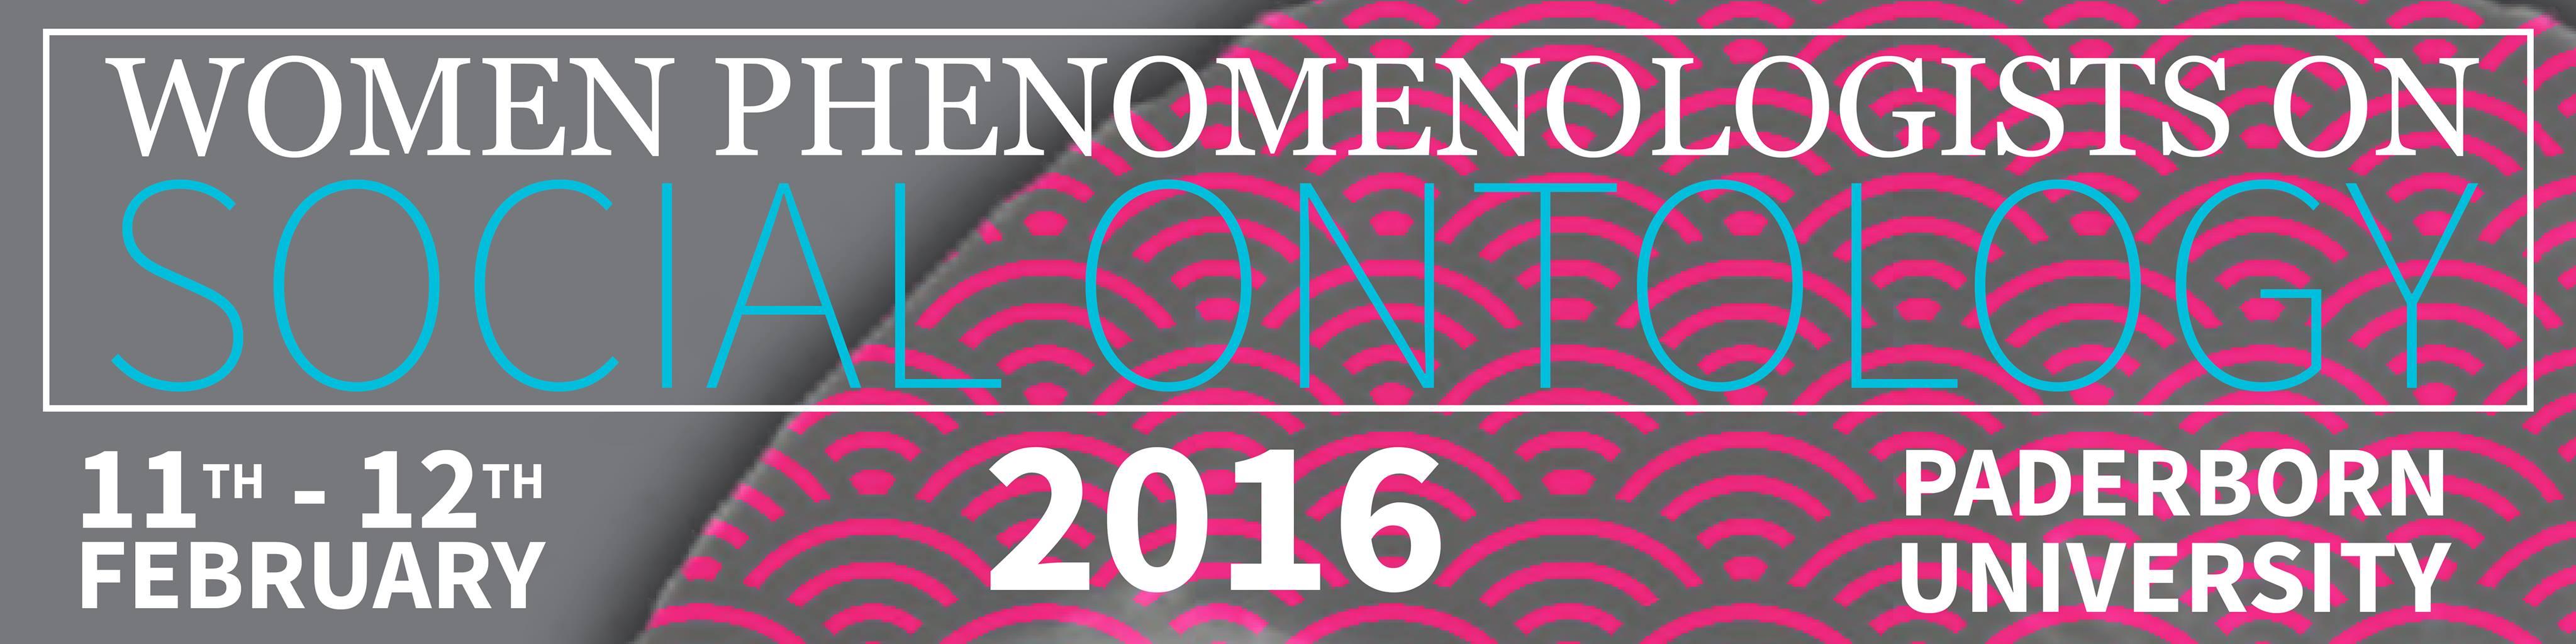 Women Phenomenologists on Social Ontology